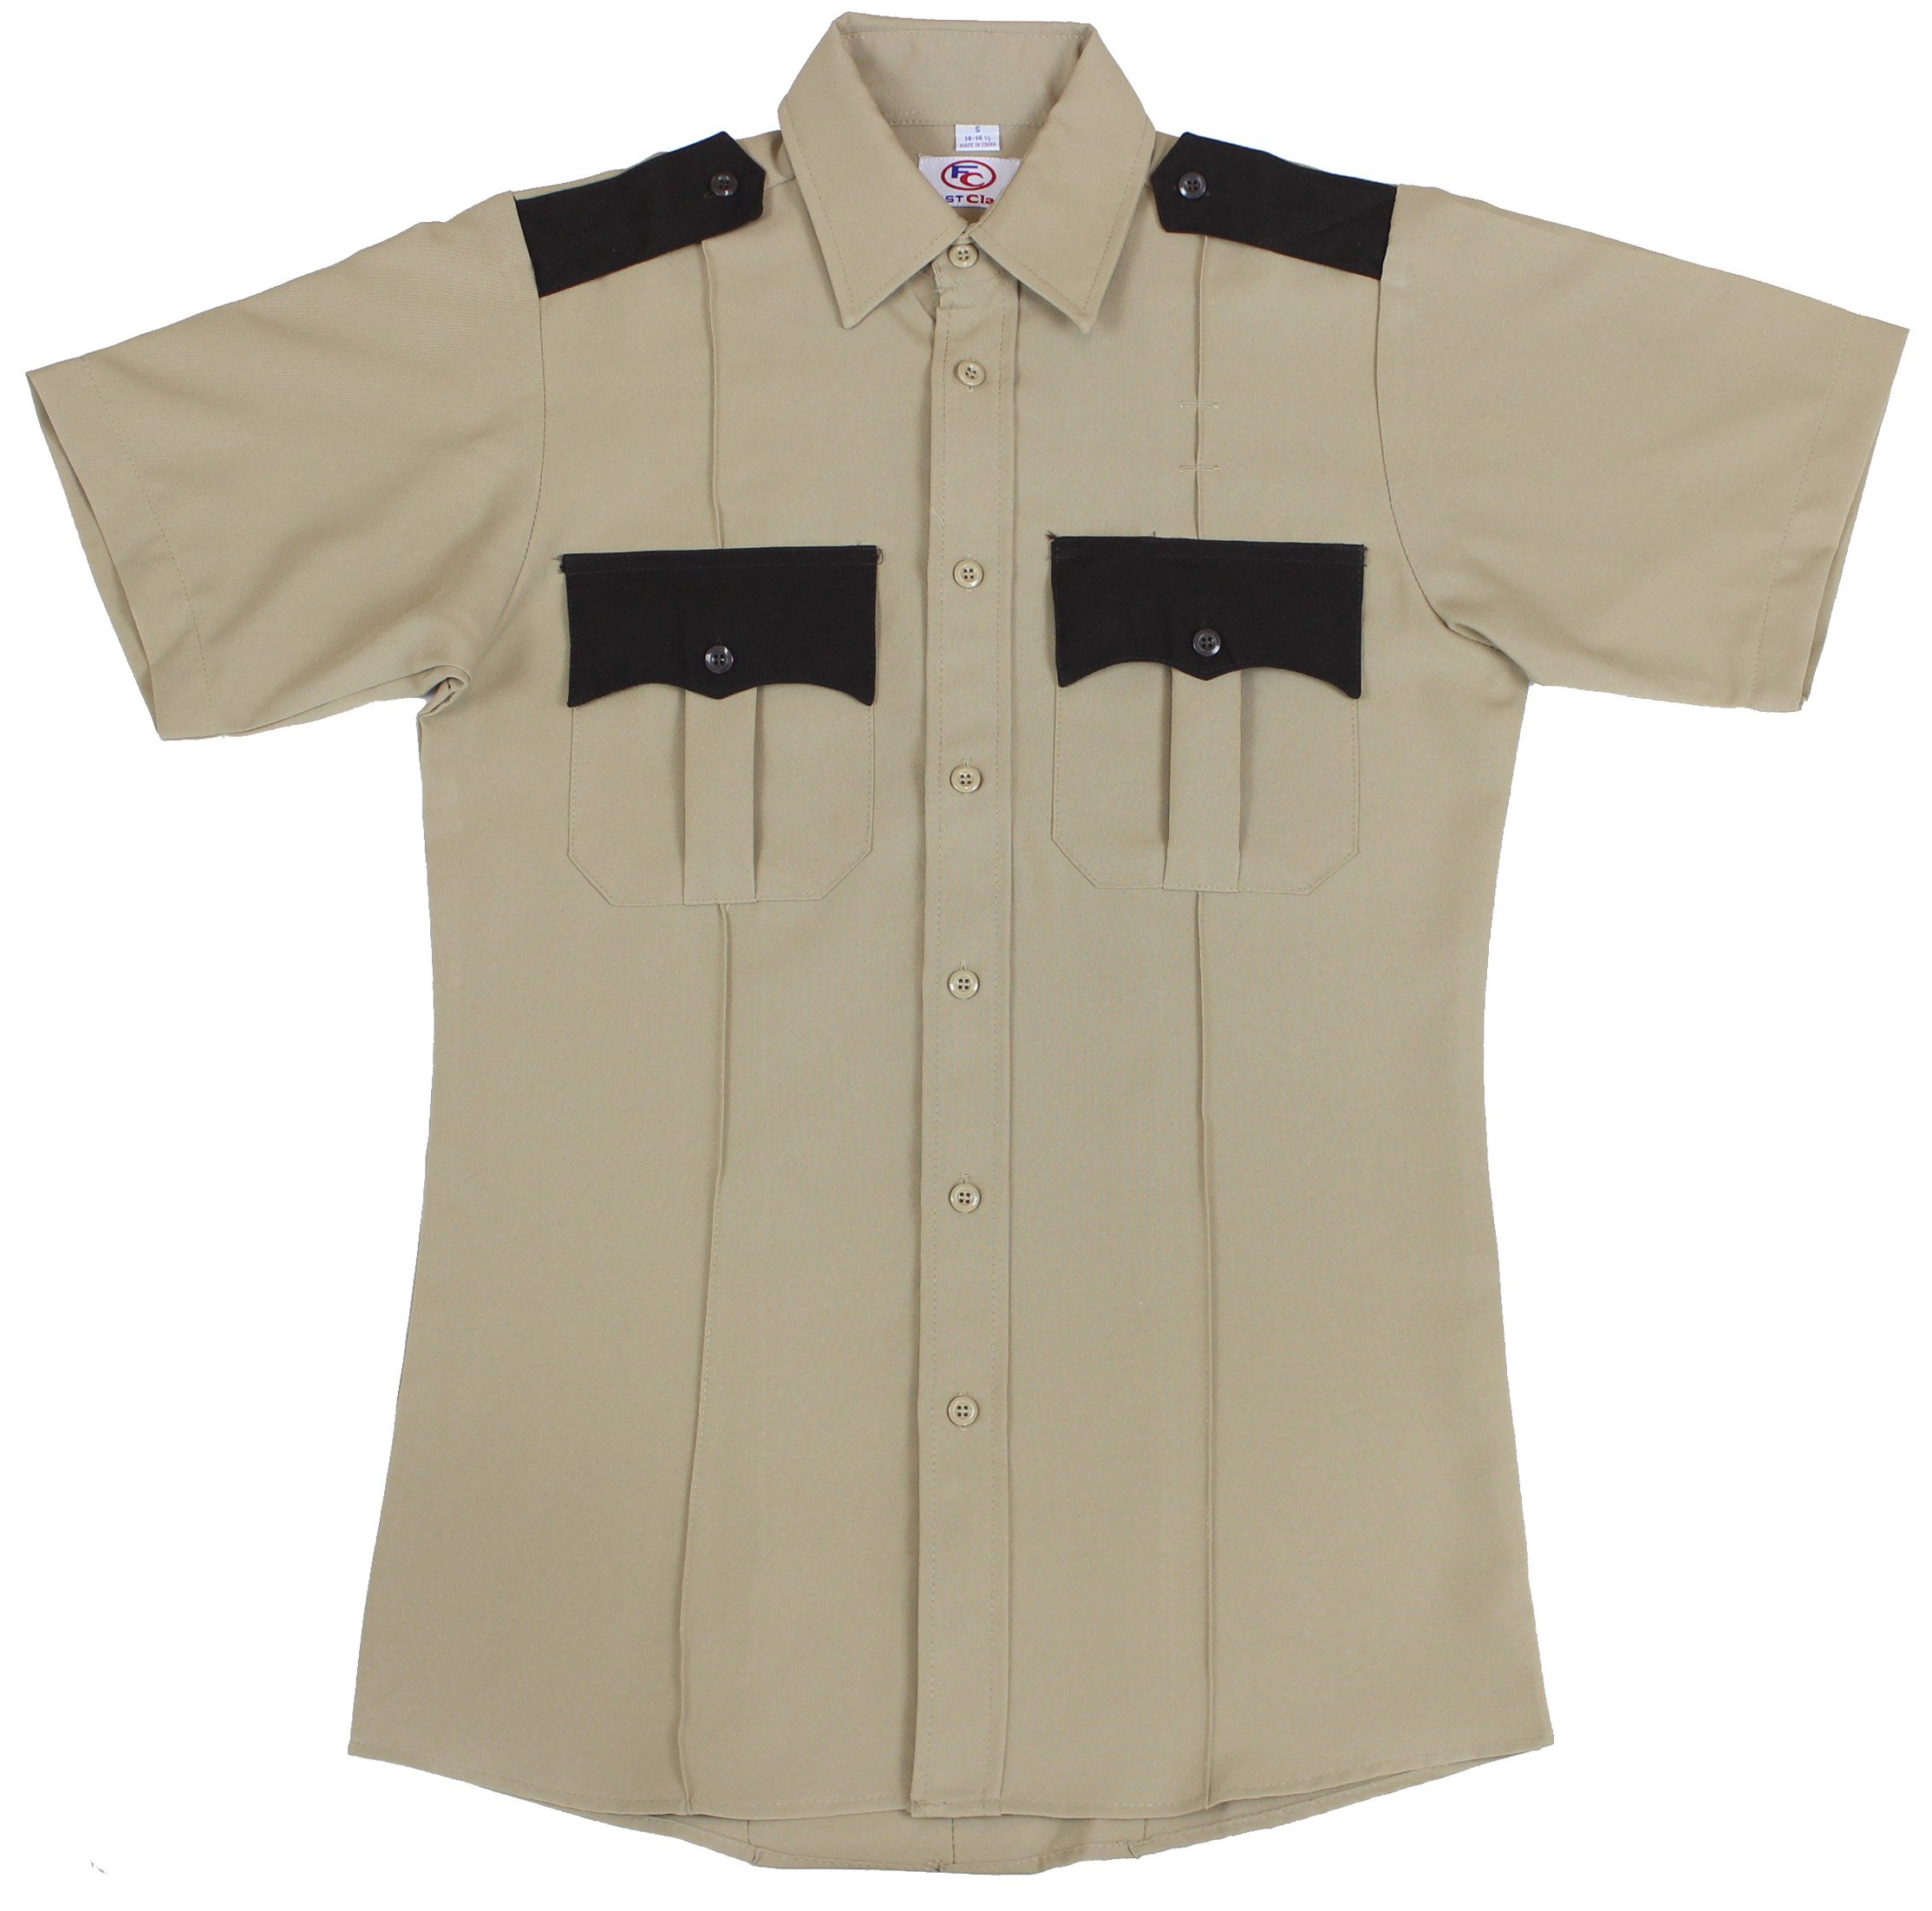 First Class Two Tone Short Sleeve Shirt-Tan & Brown/XL